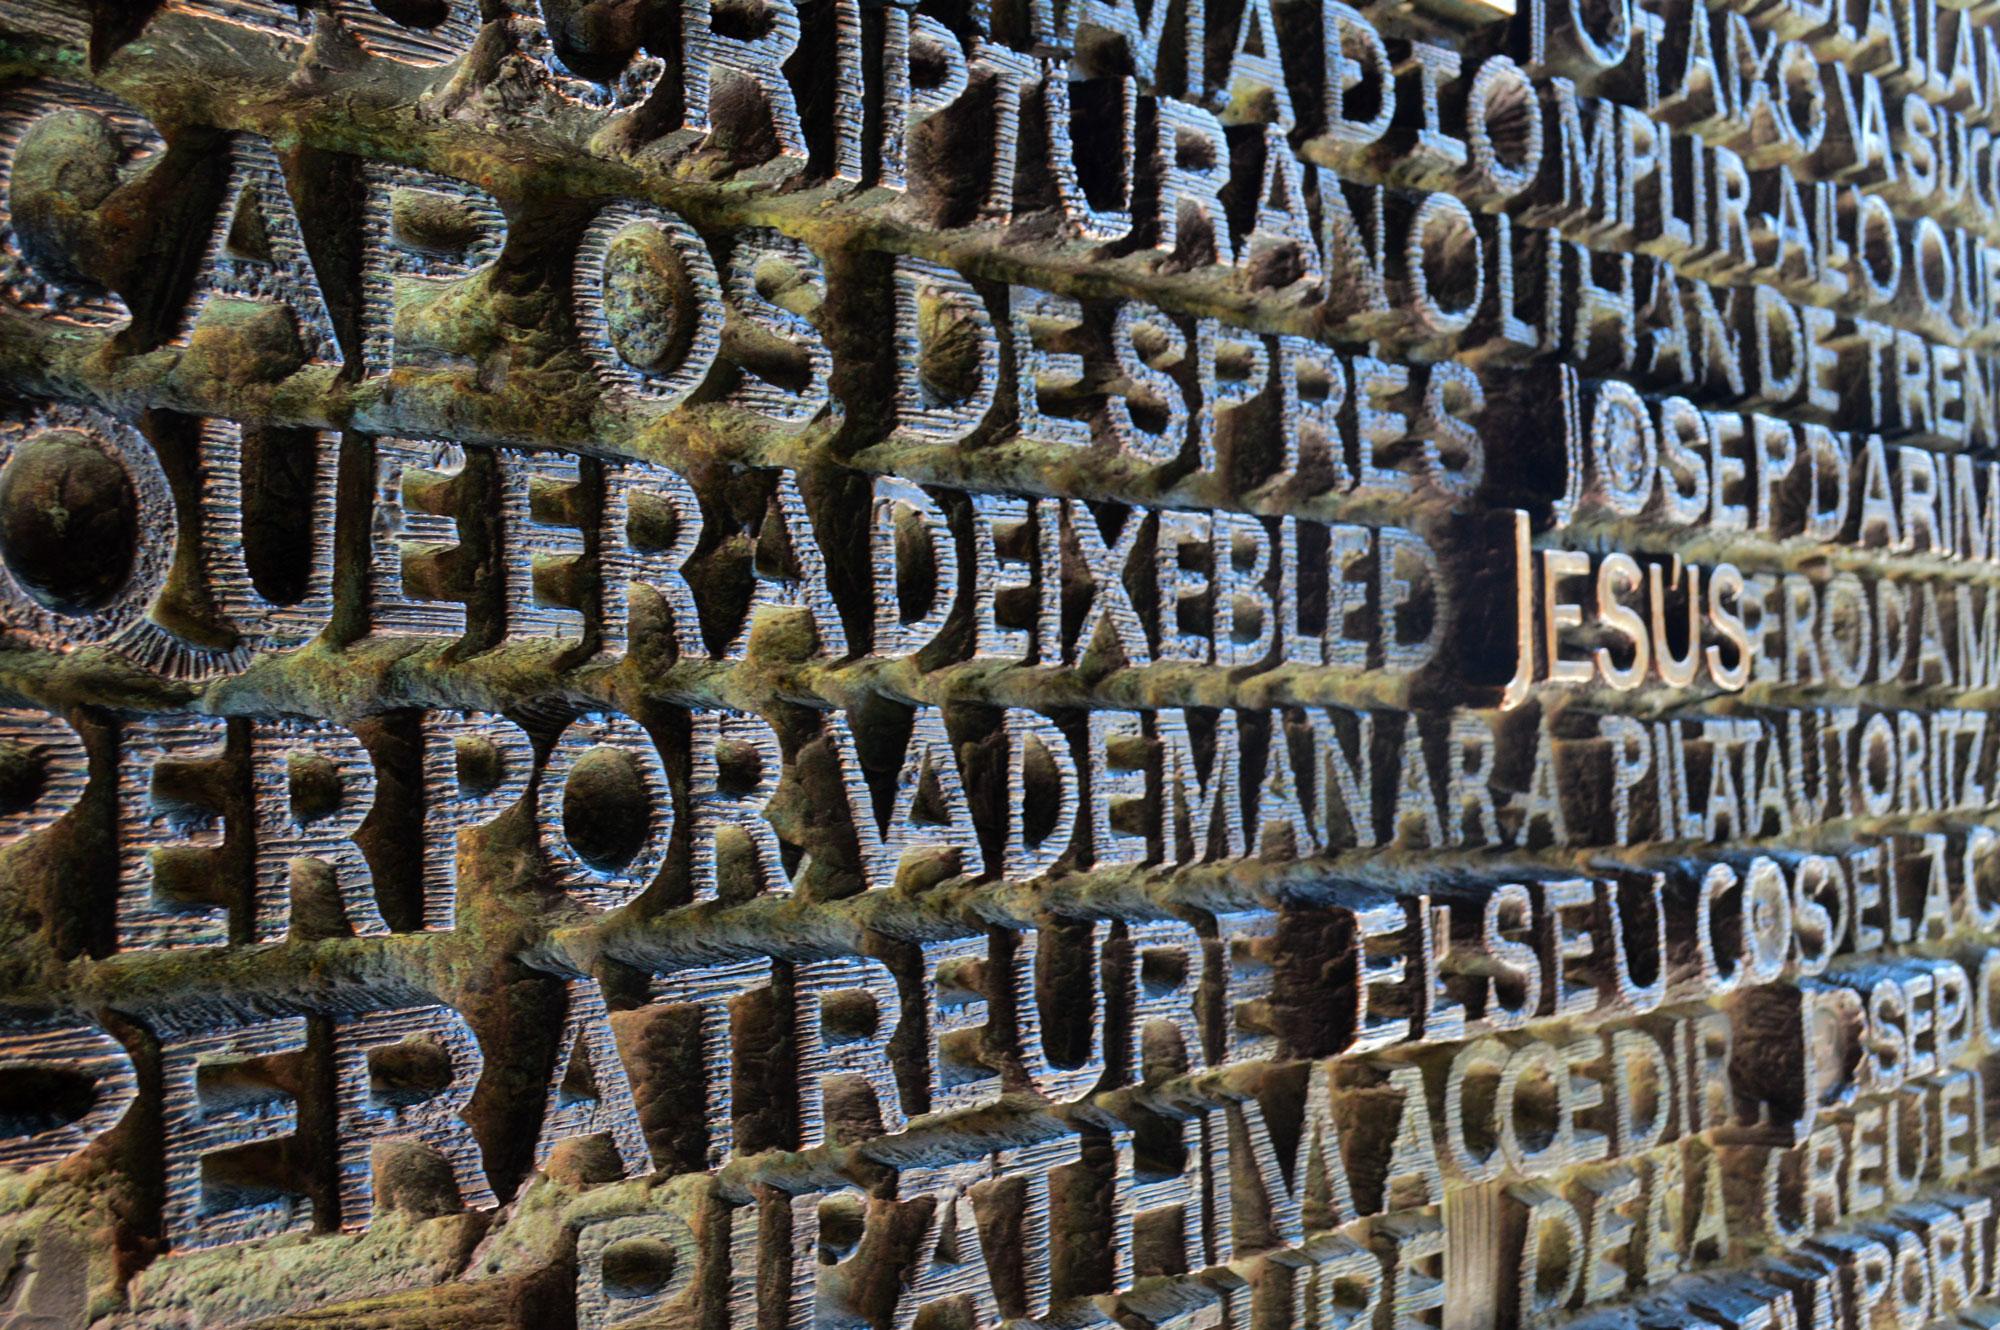 Sagrada Familia, Barcelona, Spain, 2015